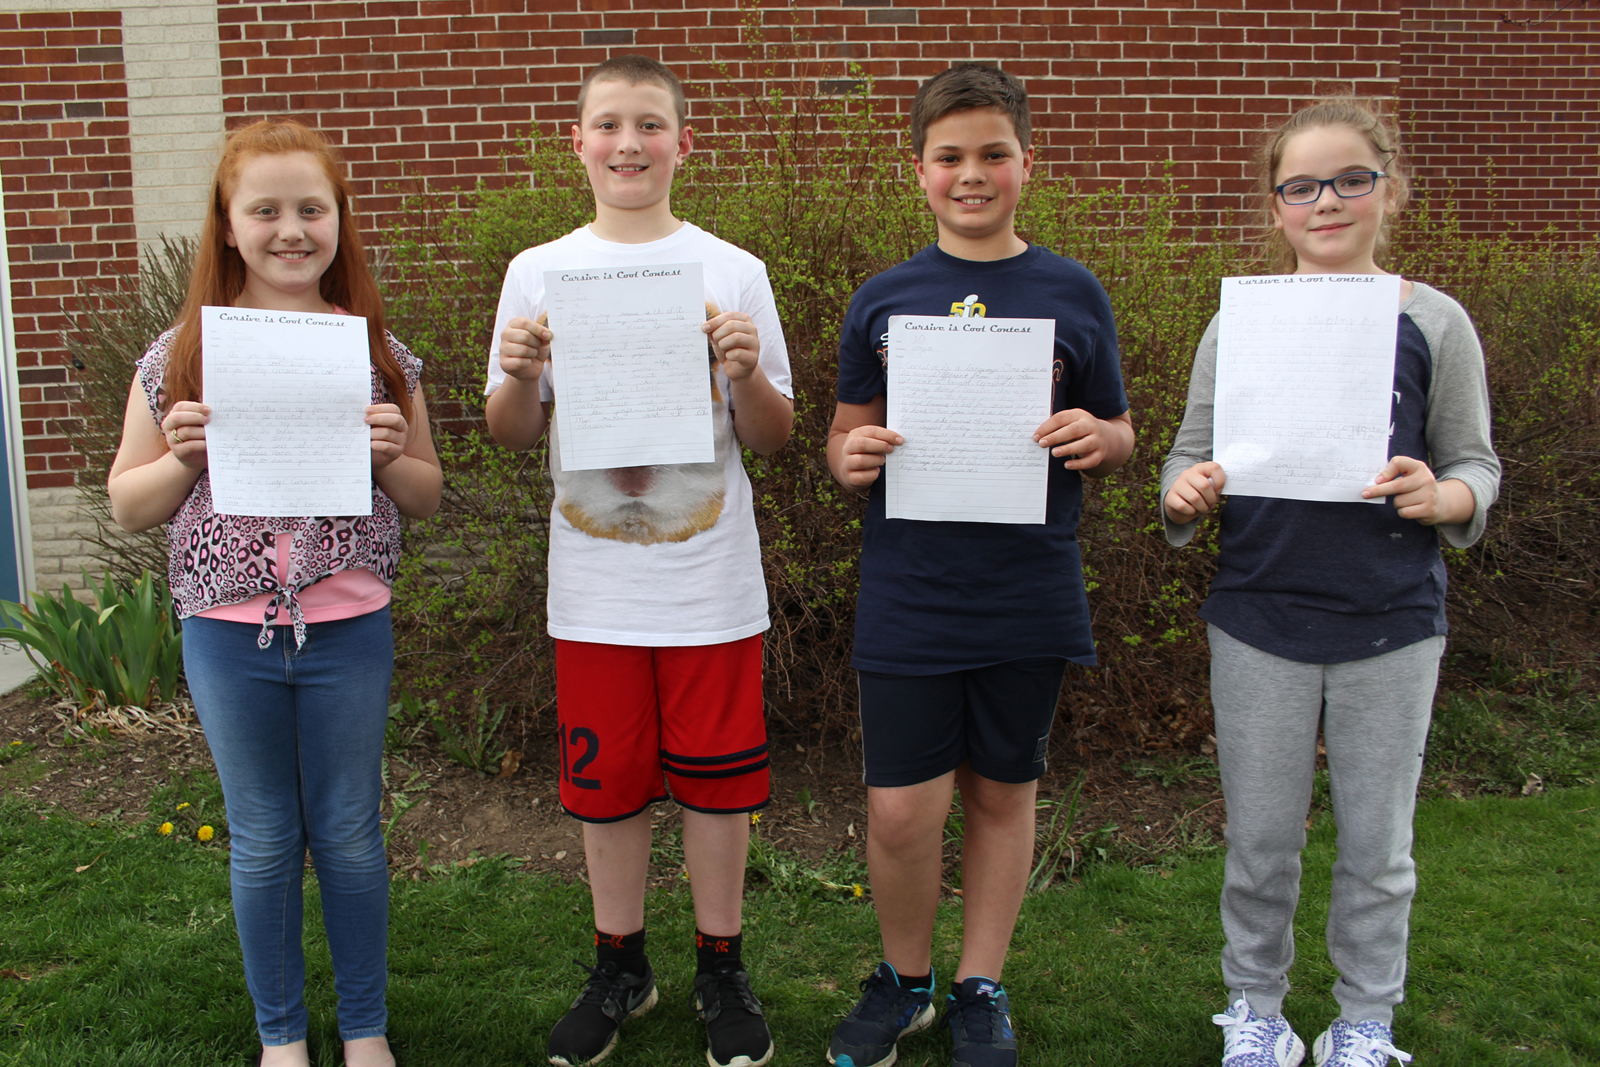 Allyson Fien, Ethan Enderle, Jason Kleehammer and Elsye Klump show off their winning entries. Provided photo